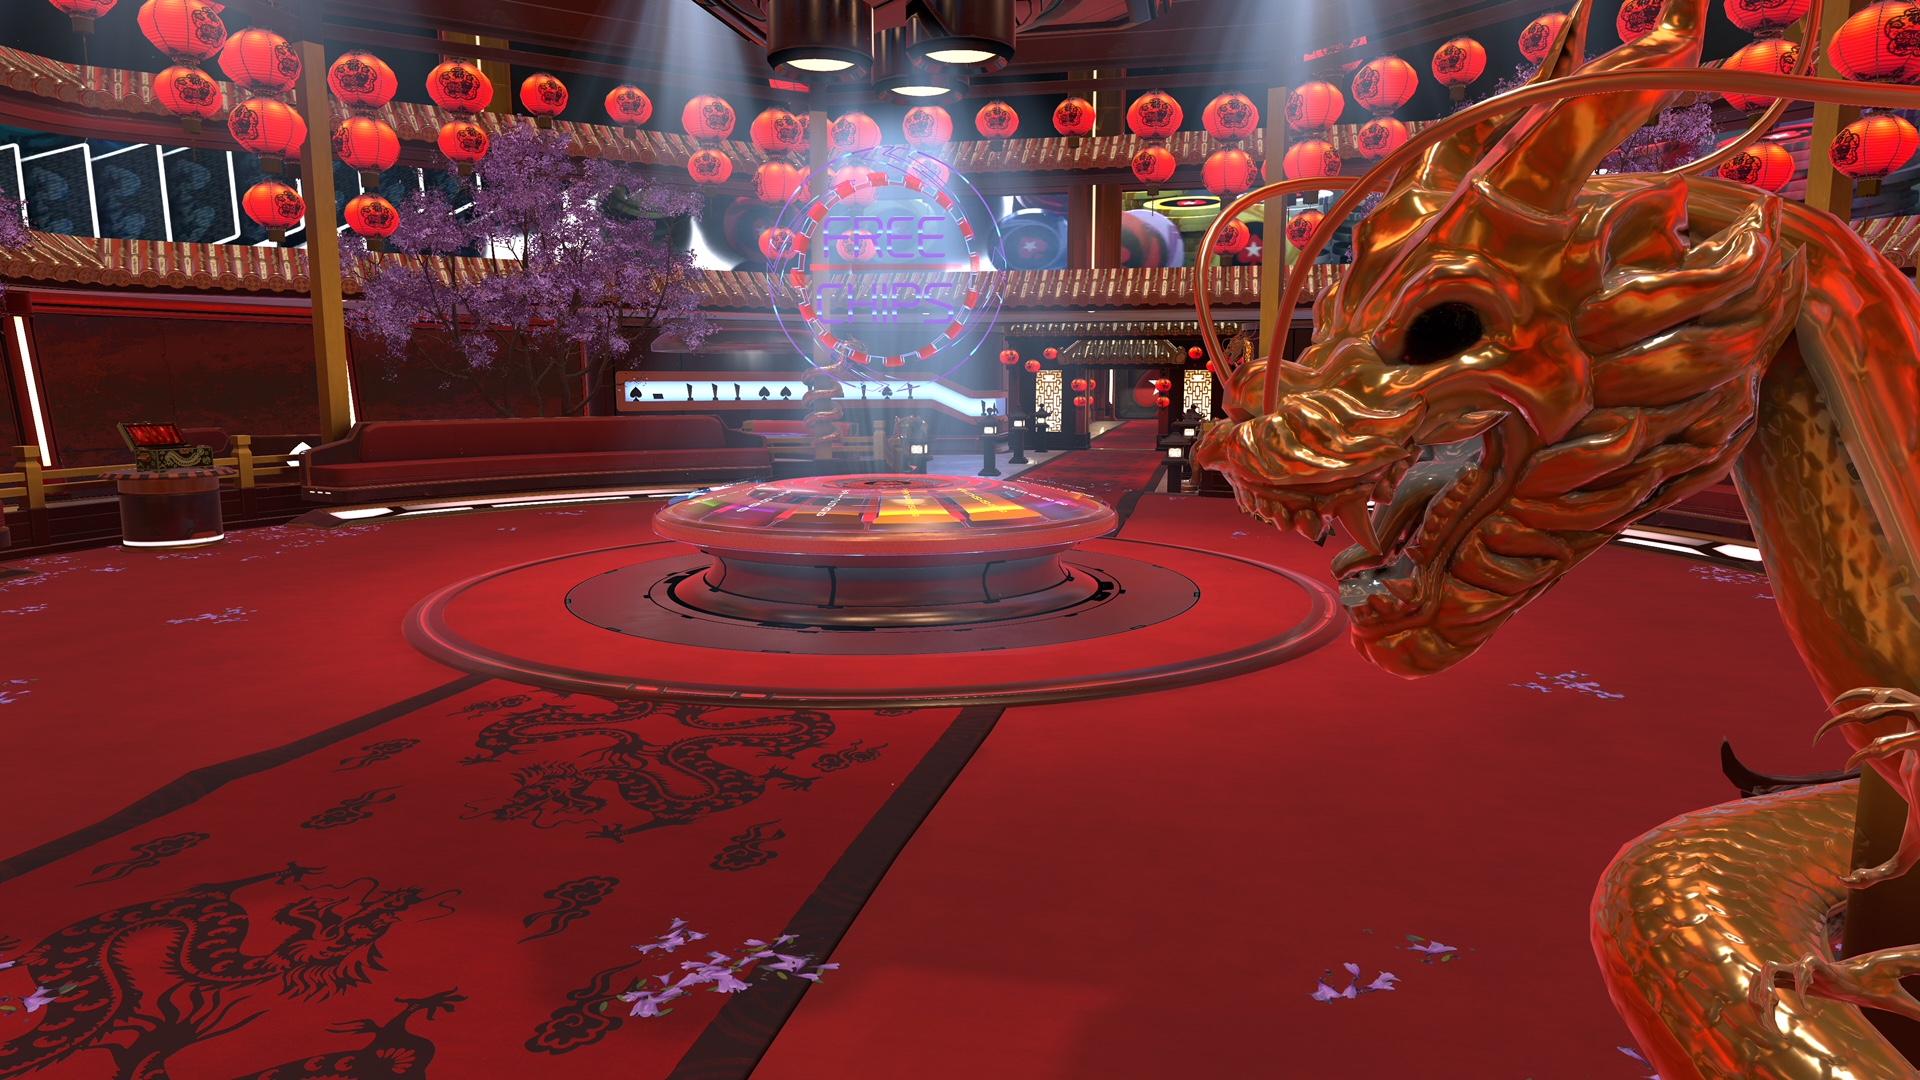 PokerStarsVR Lobby Lunar New Year